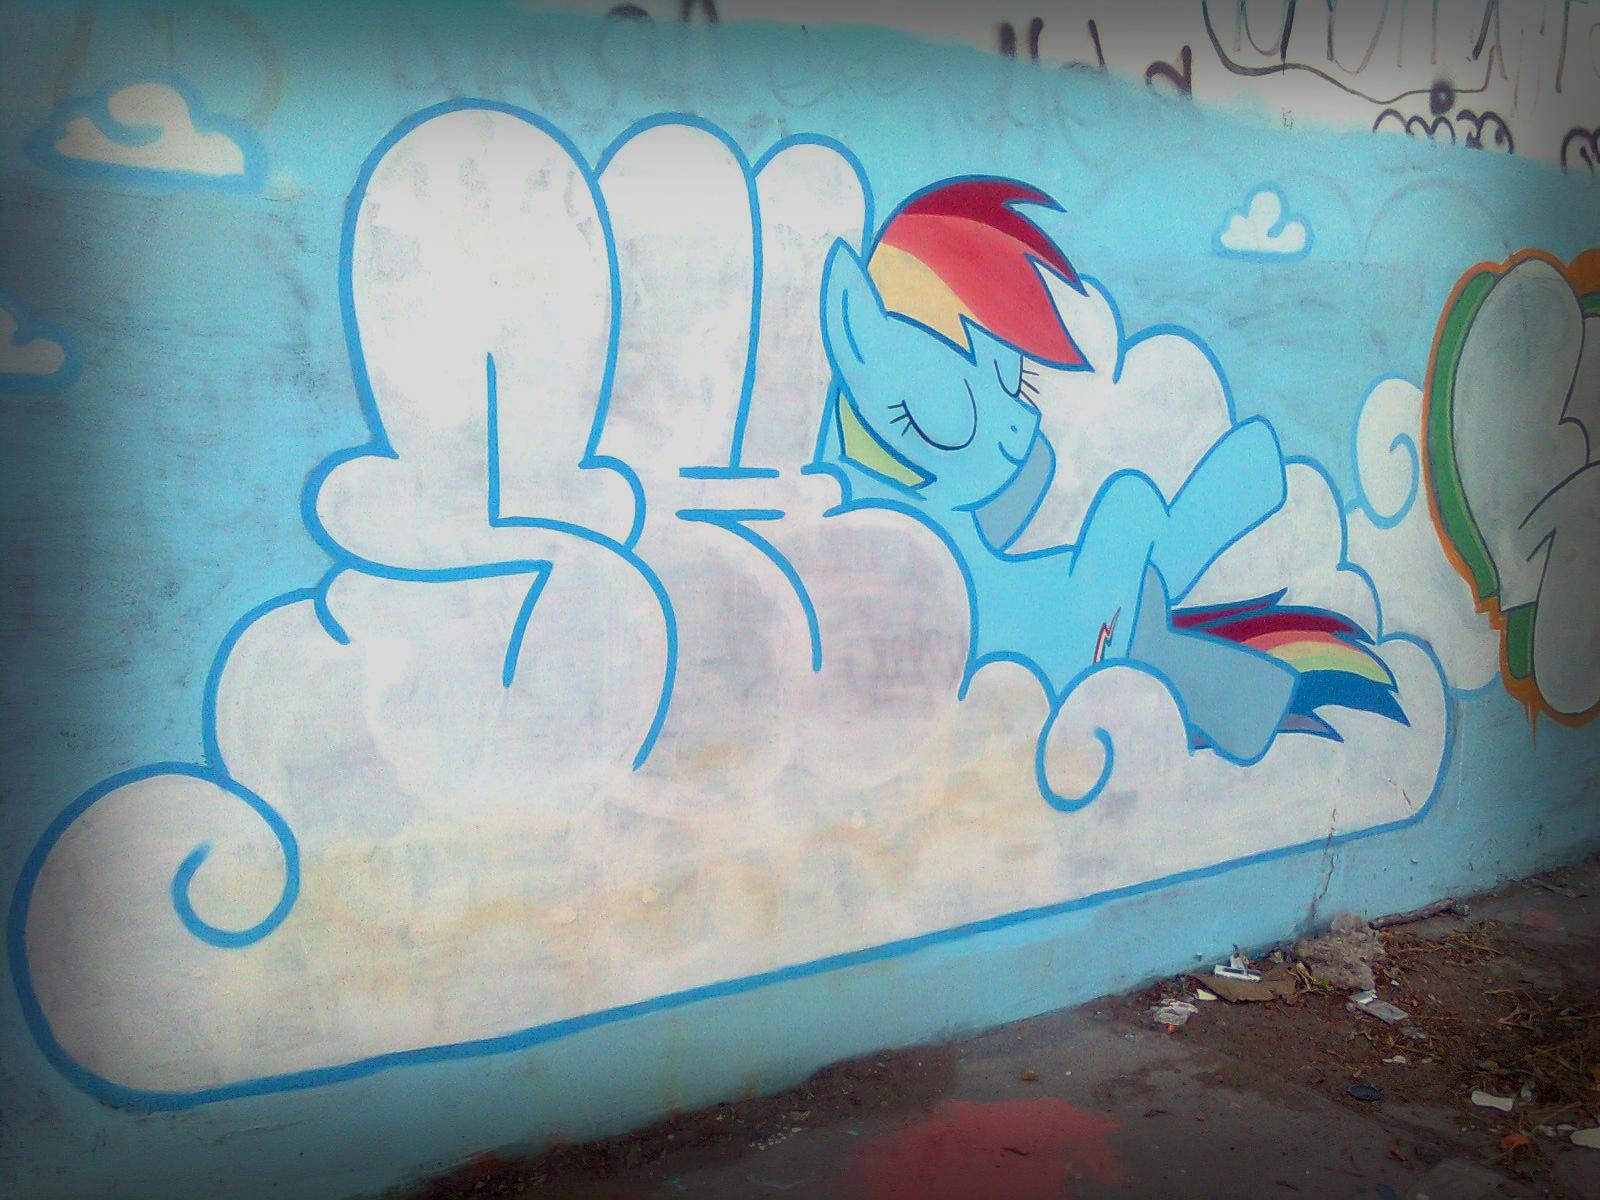 Graffiti My little pony by ShinodaGE